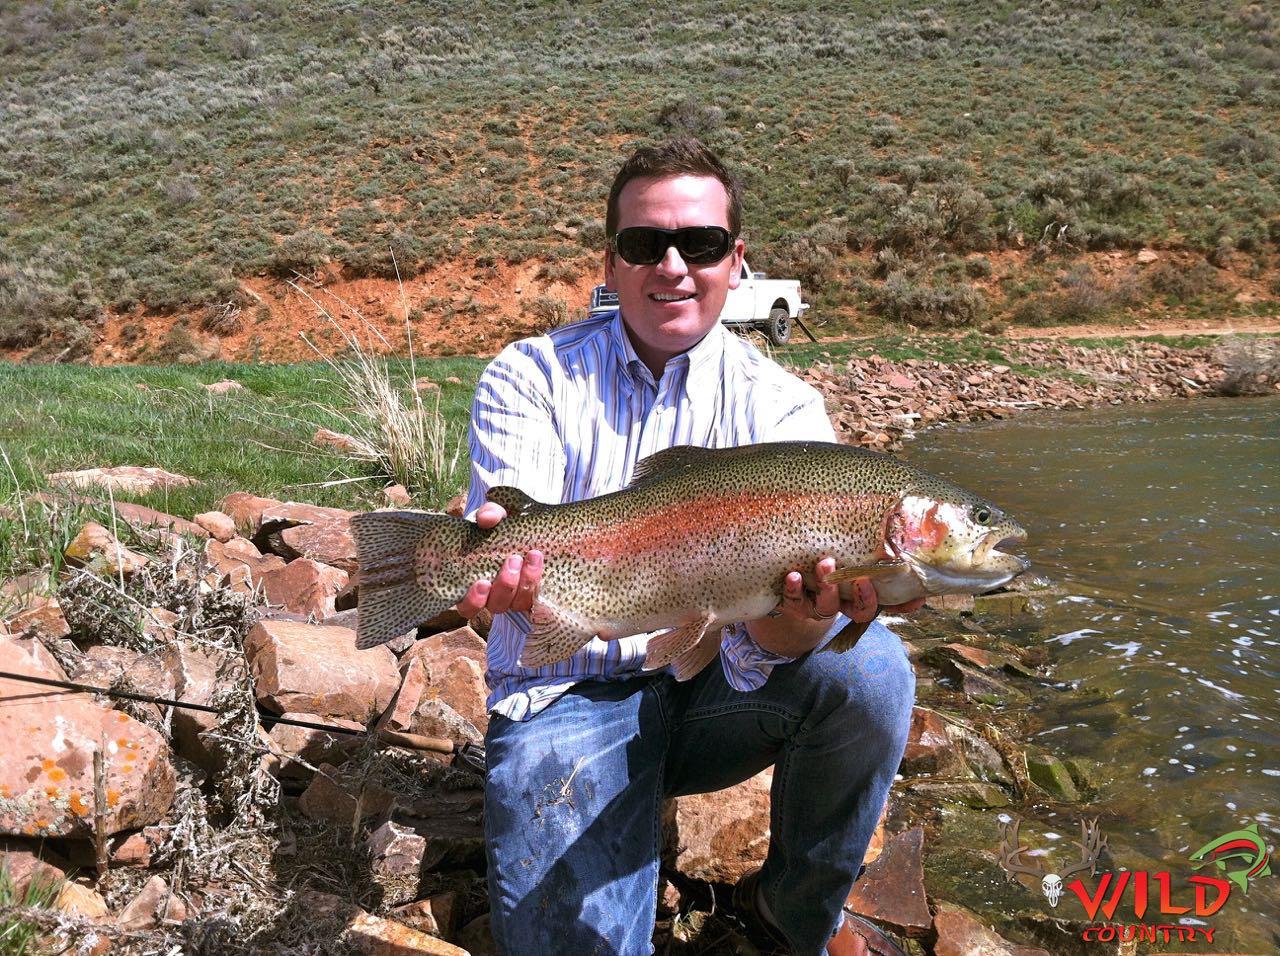 fly fishing utah rainbow trout - 48.jpg